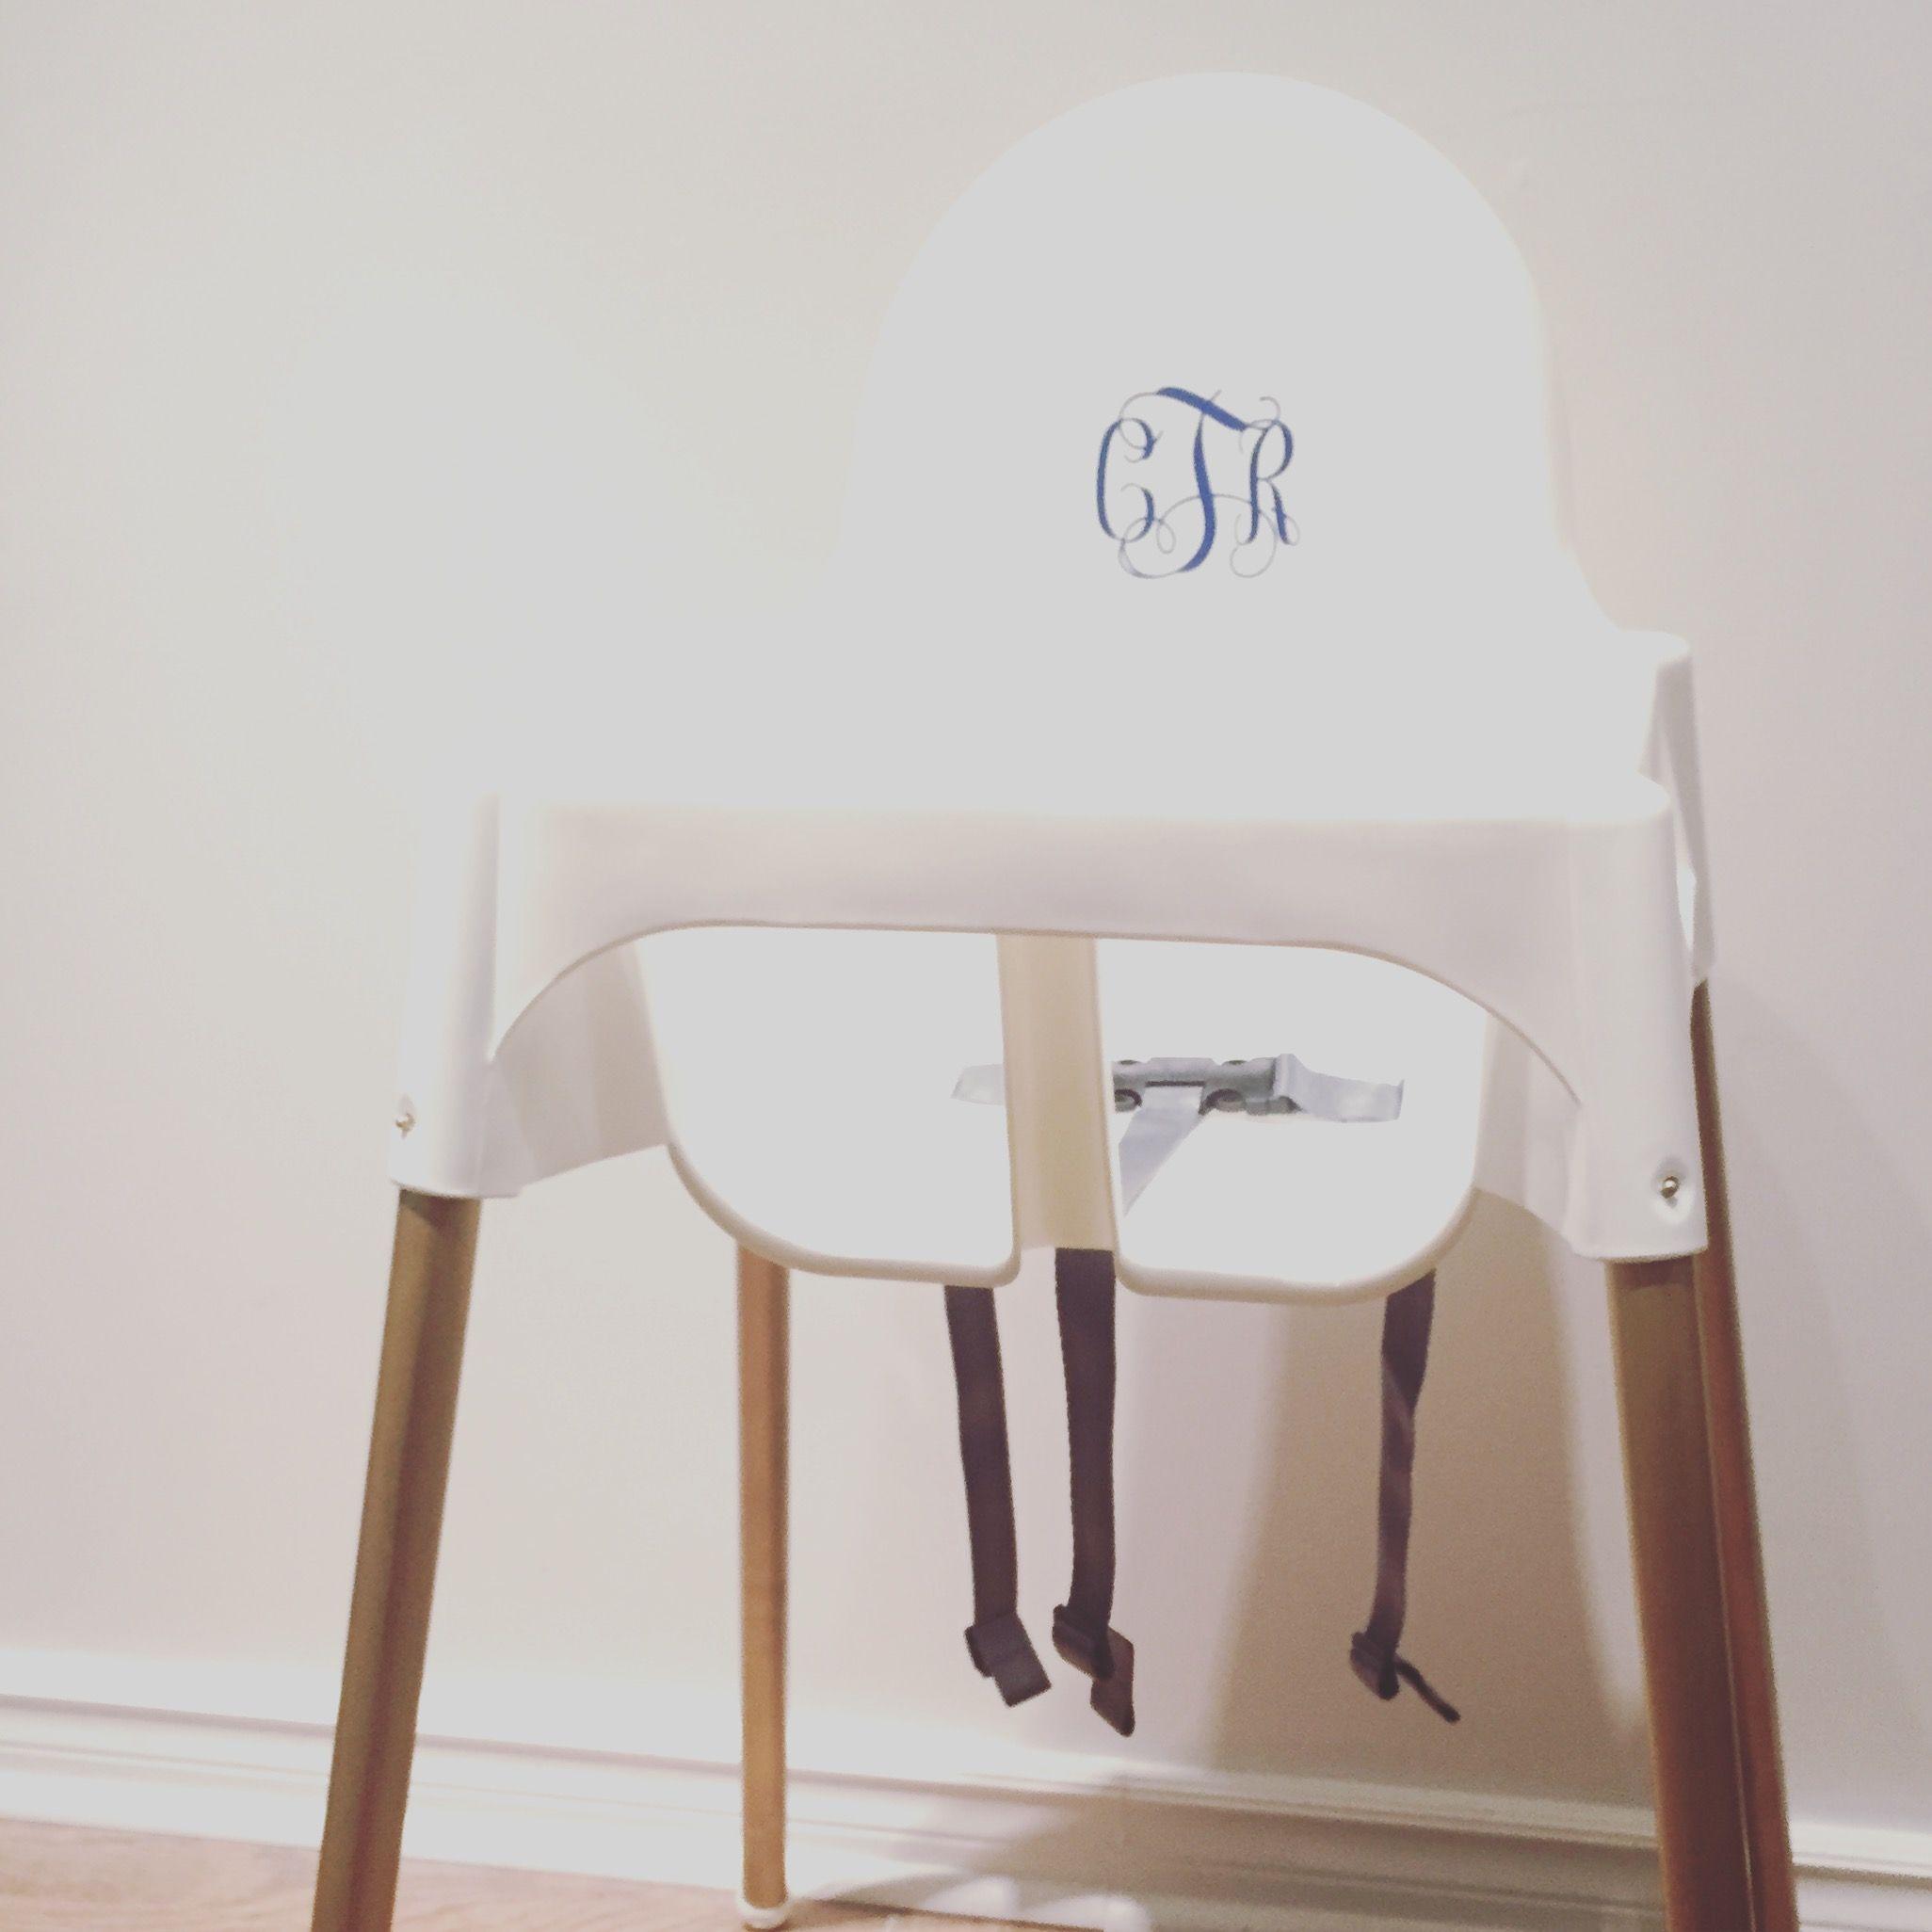 Ikea High Chair Face Lift by Jace Ikea high chair, Home